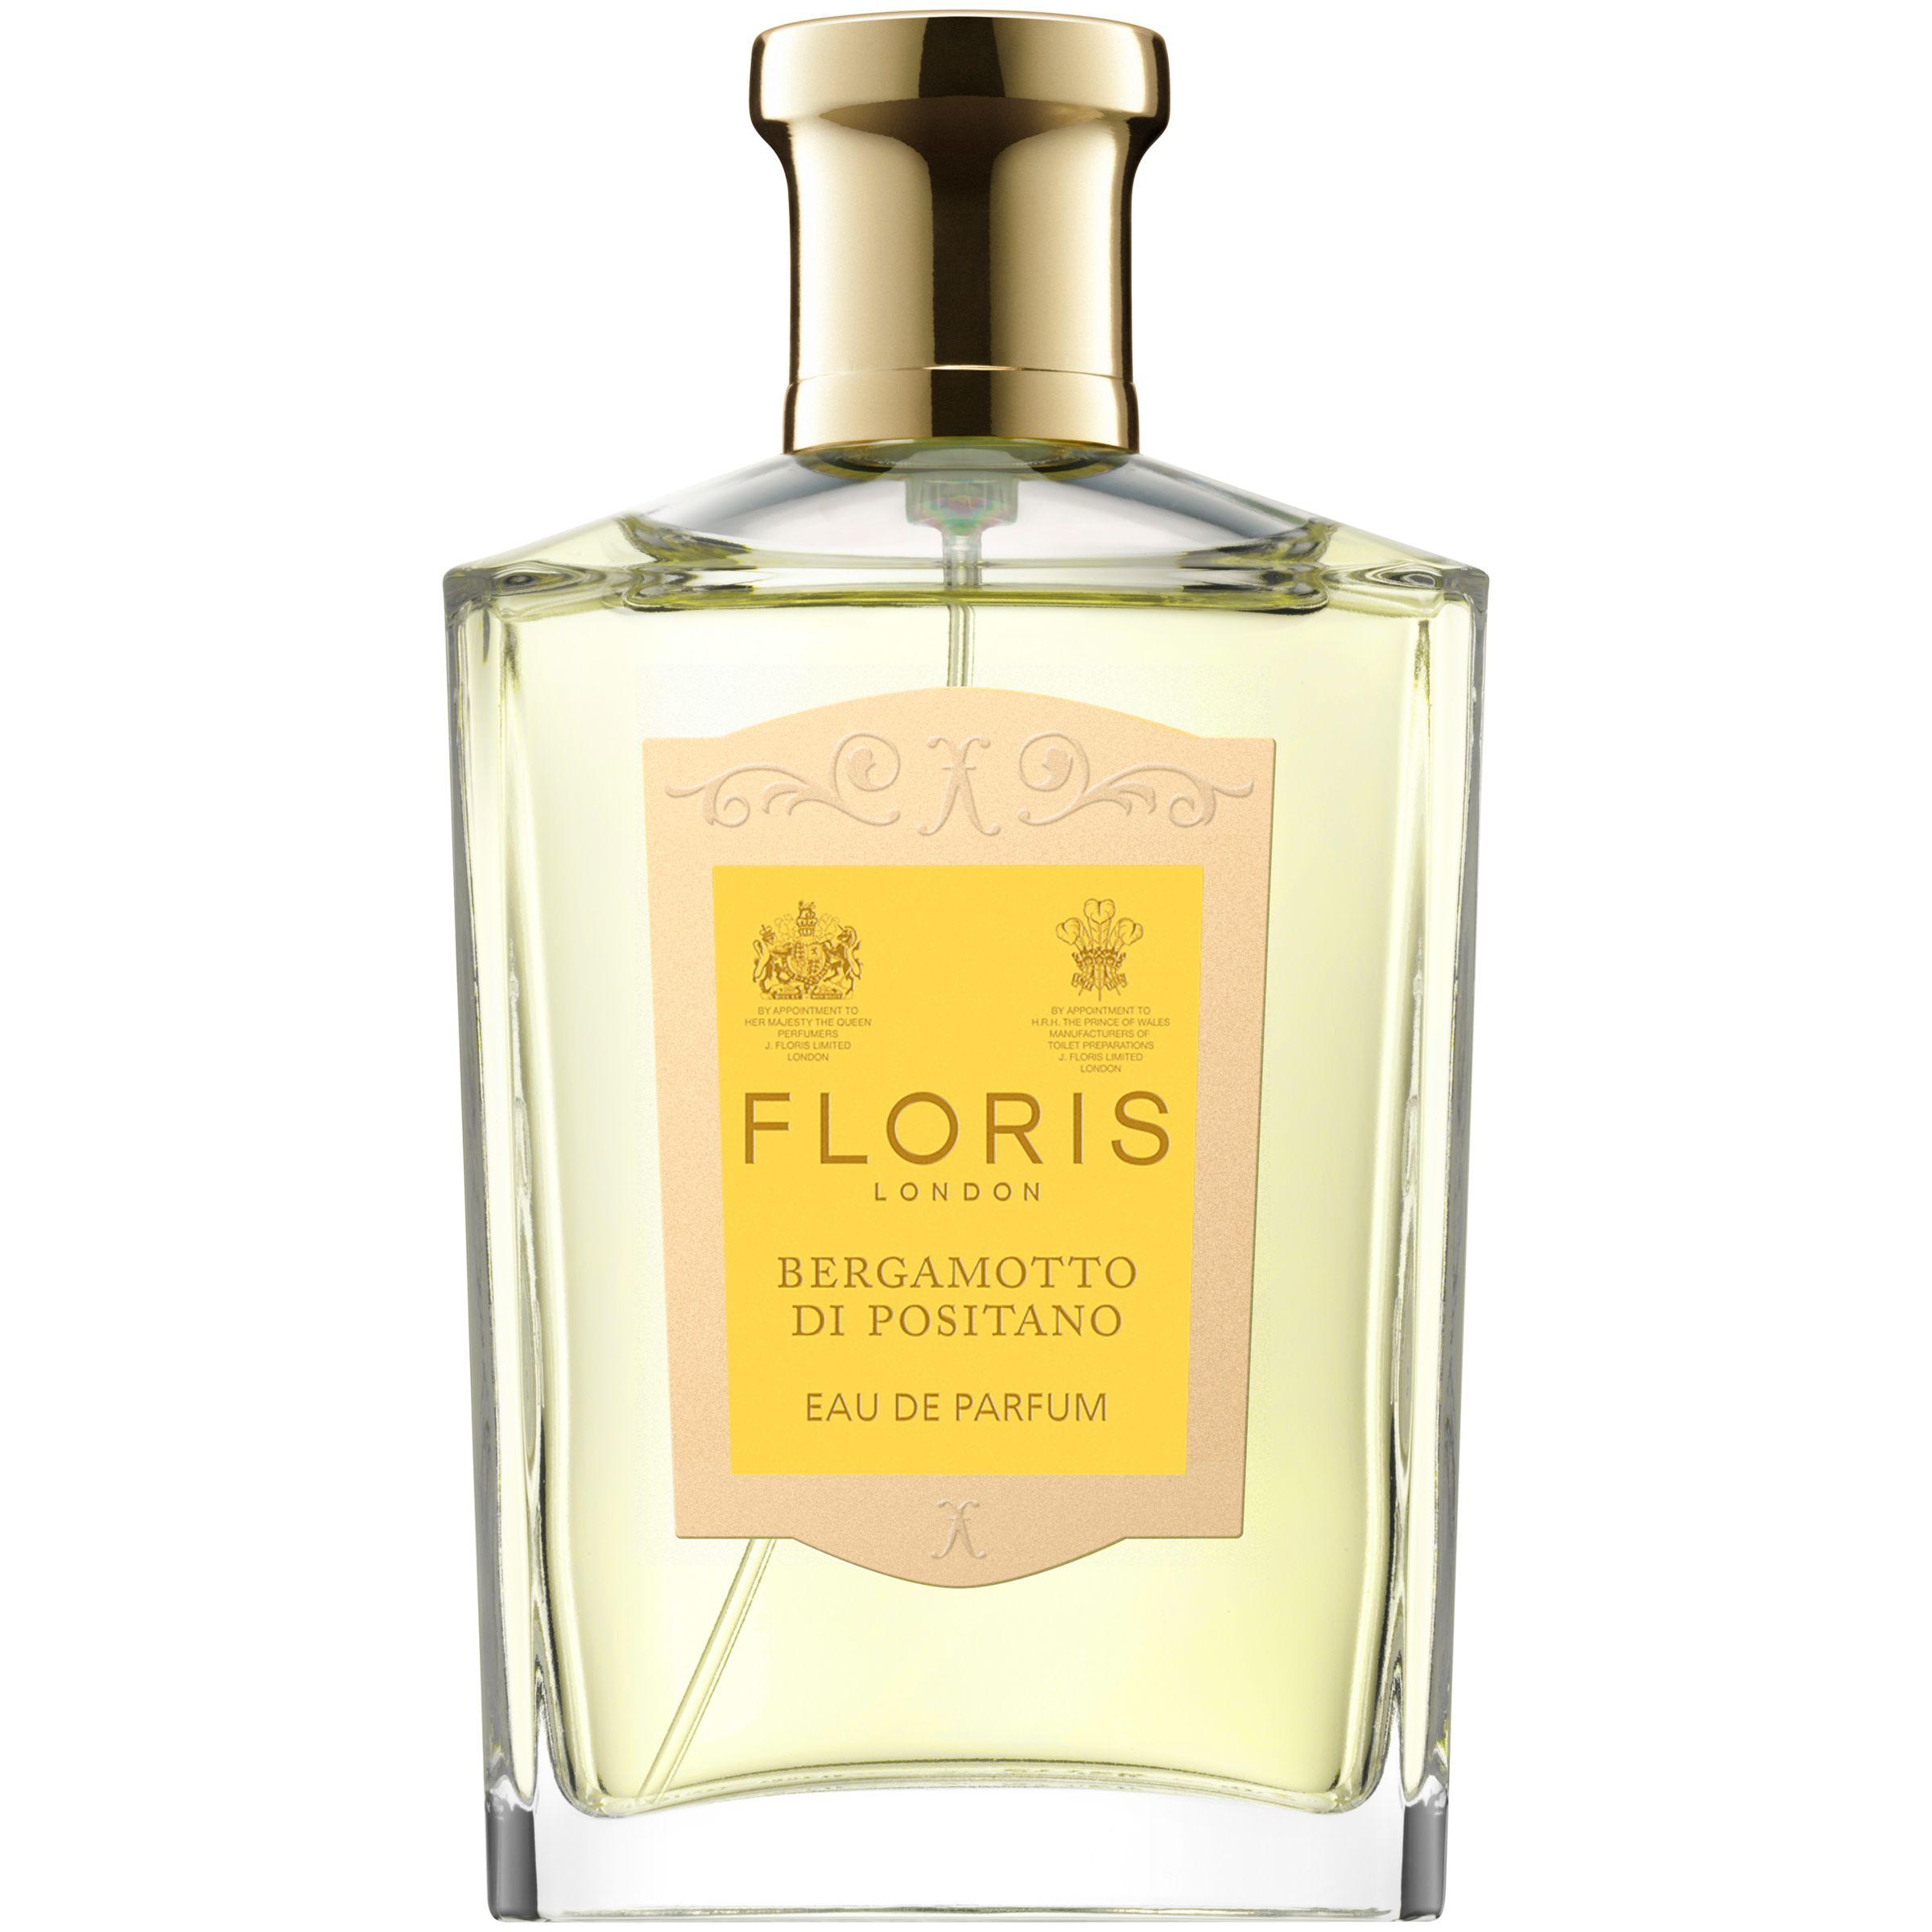 Floris Floris Bergamotto Di Positano Eau de Parfum, 100ml